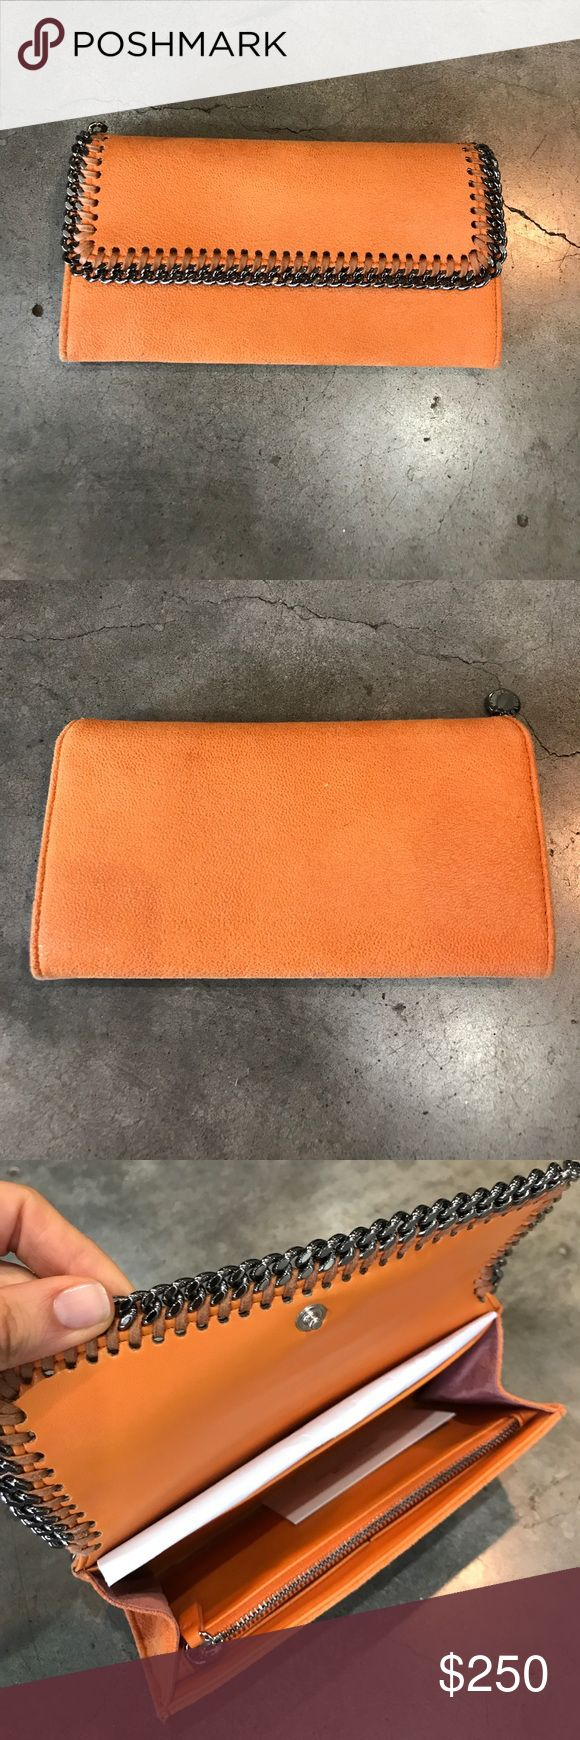 Stella McCartney Falabella Wallet Orange Stella McCartney wallet. Like new, box included. Stella McCartney Bags Wallets